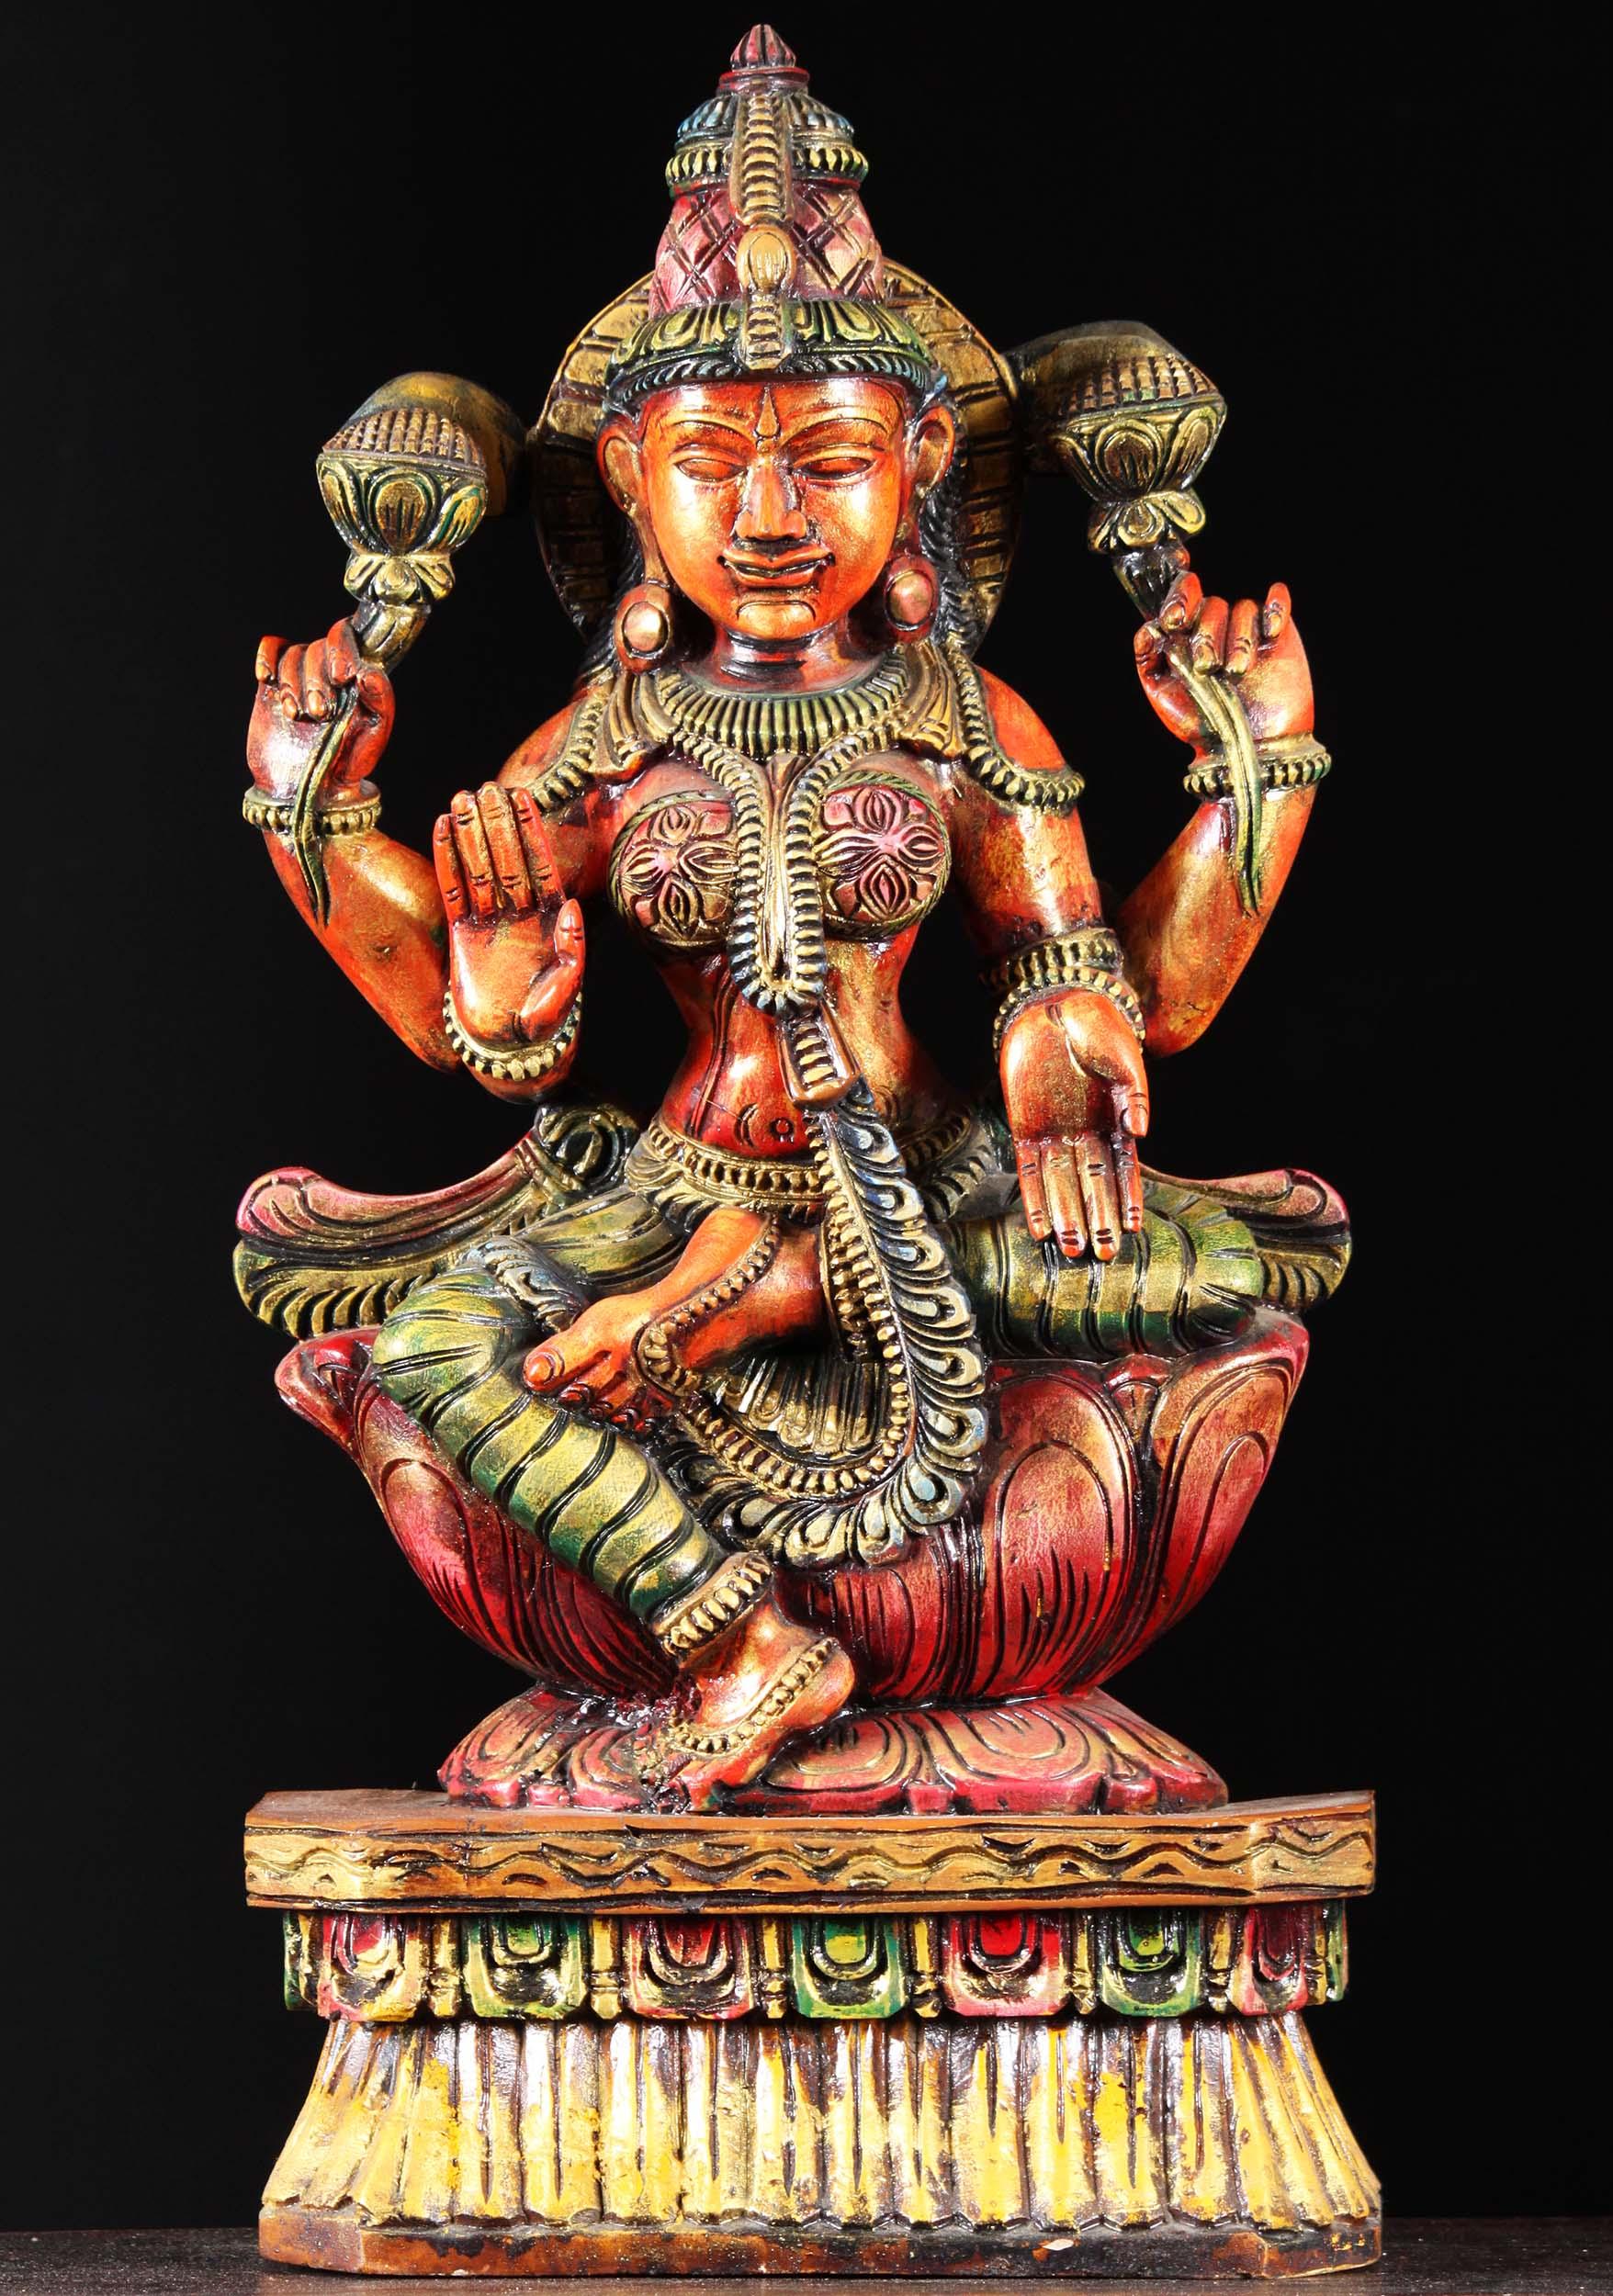 Wooden Lakshmi Statue With Lotus Flowers 24 76w1mn Hindu Gods